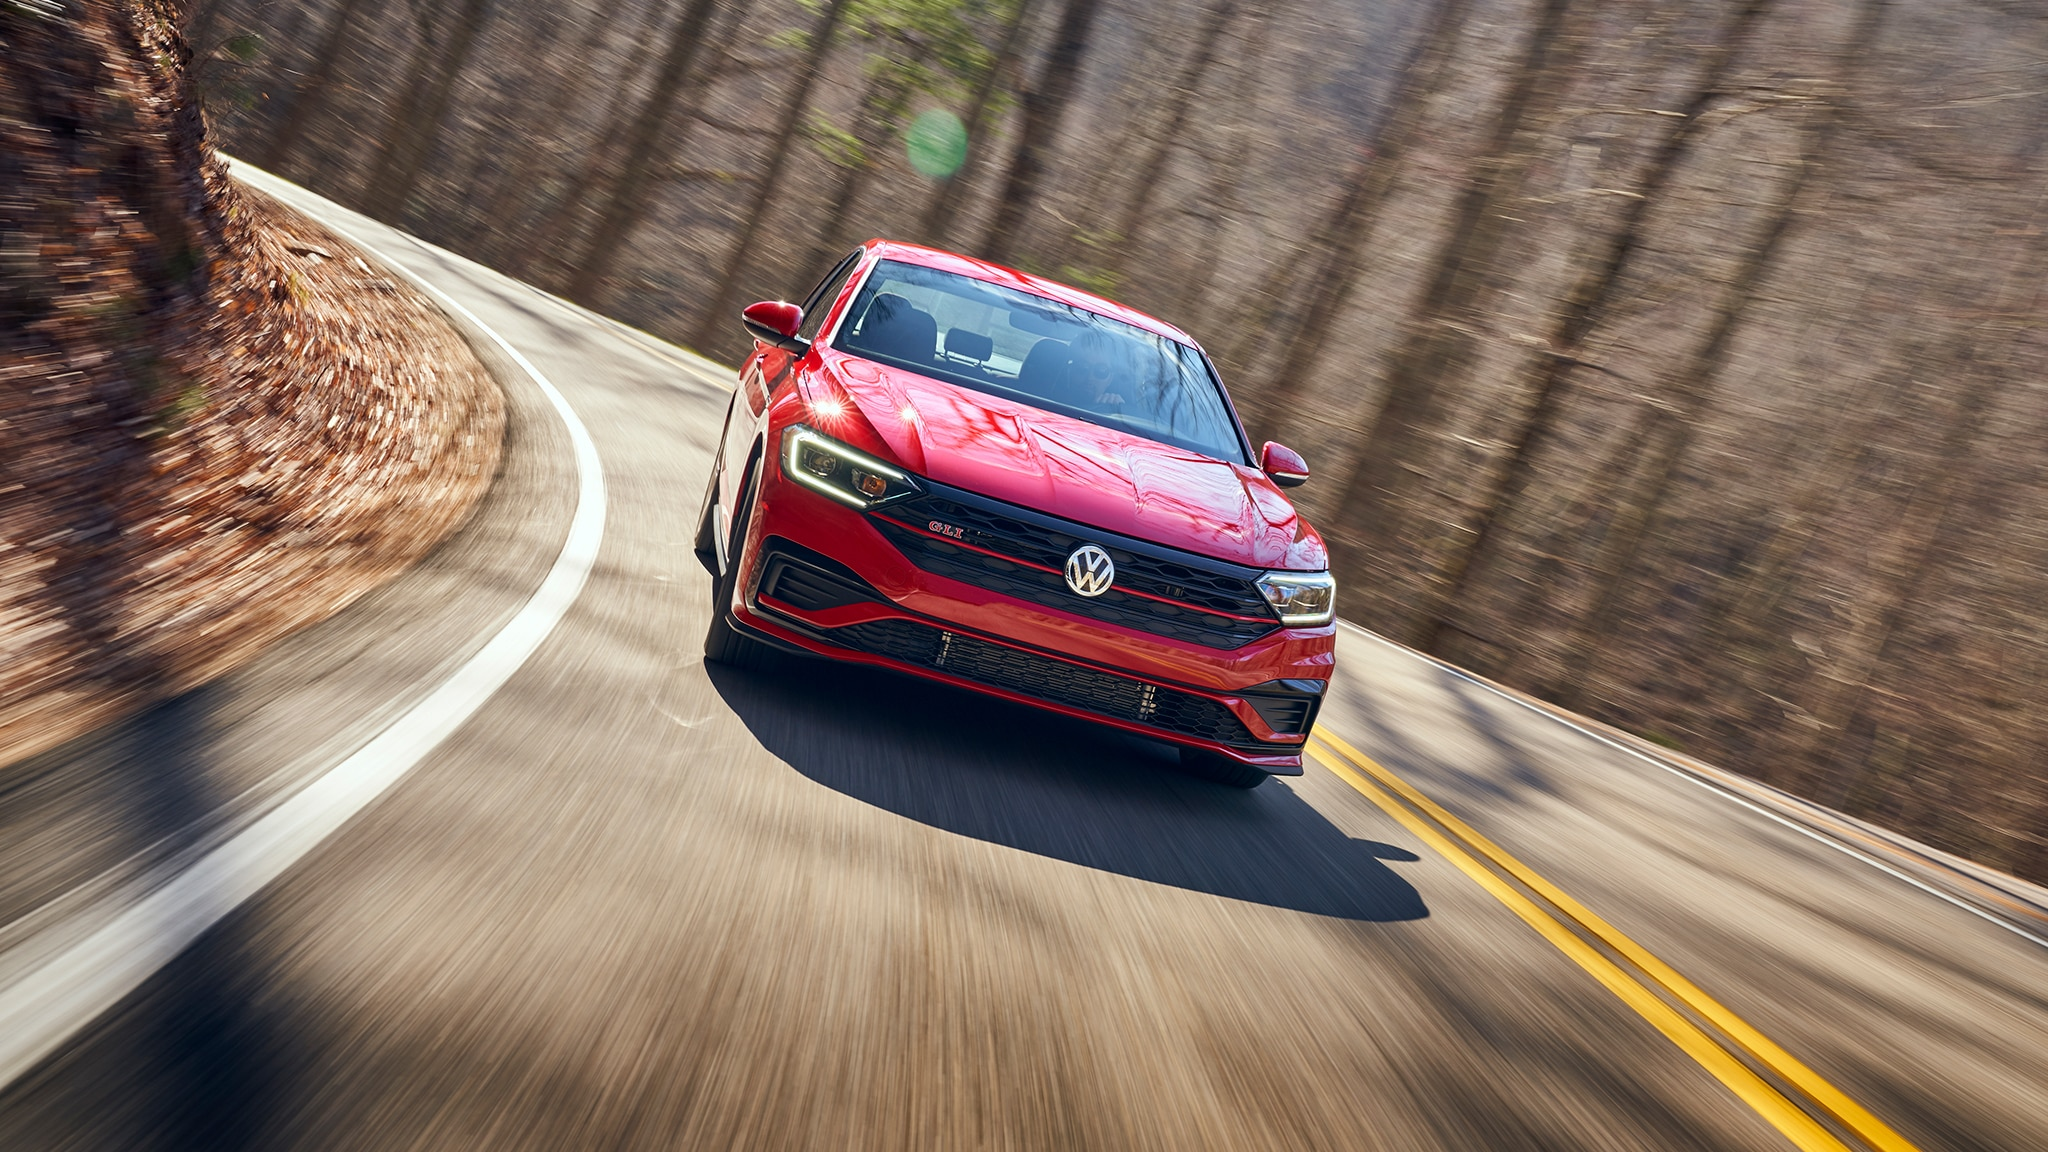 2019 Volkswagen Jetta GLI S 05